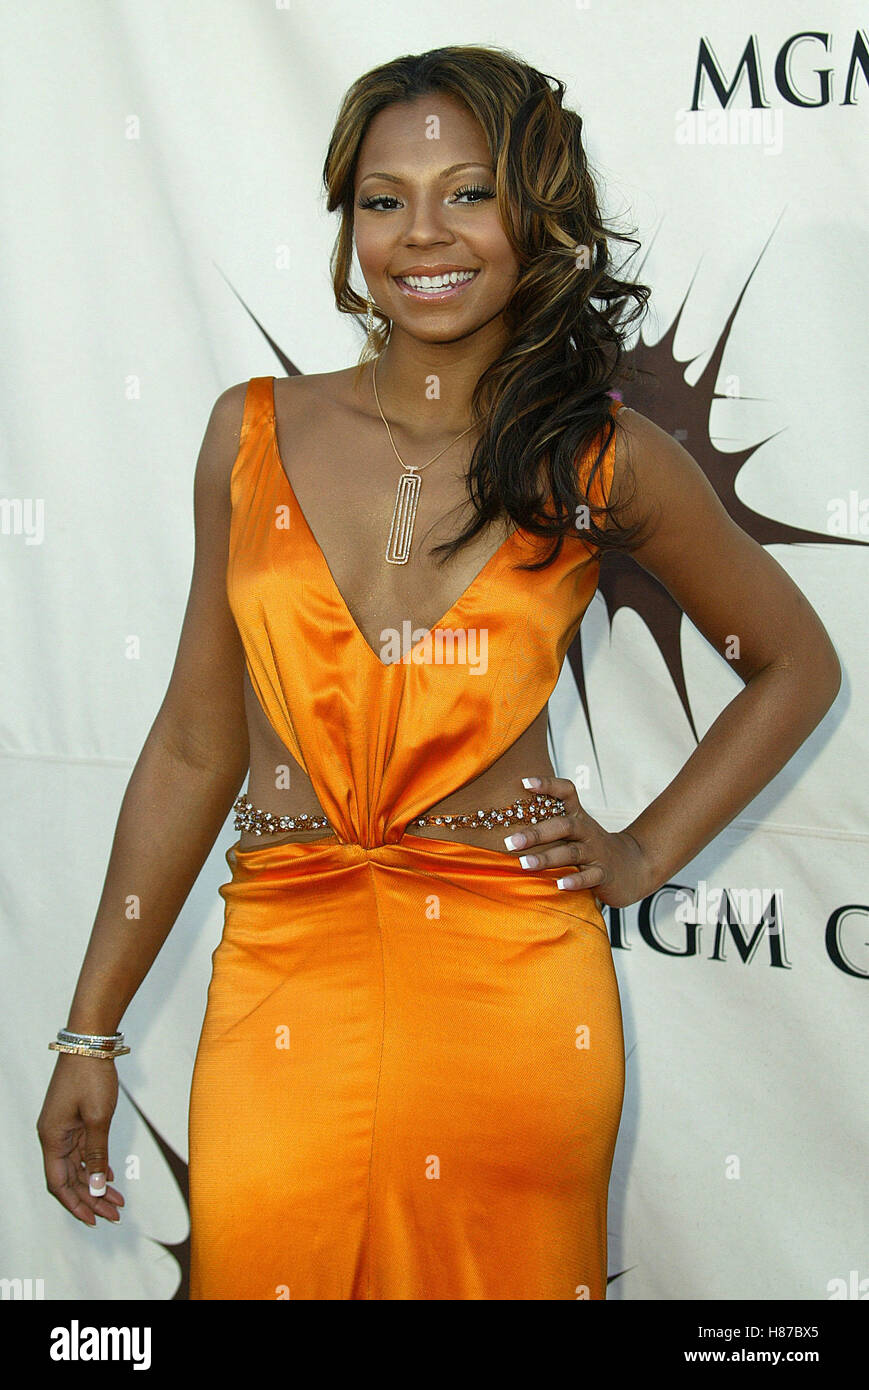 ASHANTI VH1 DIVAS DUETS MGM HOTEL & CASINO LAS VEGAS USA 22 May 2003 - Stock Image